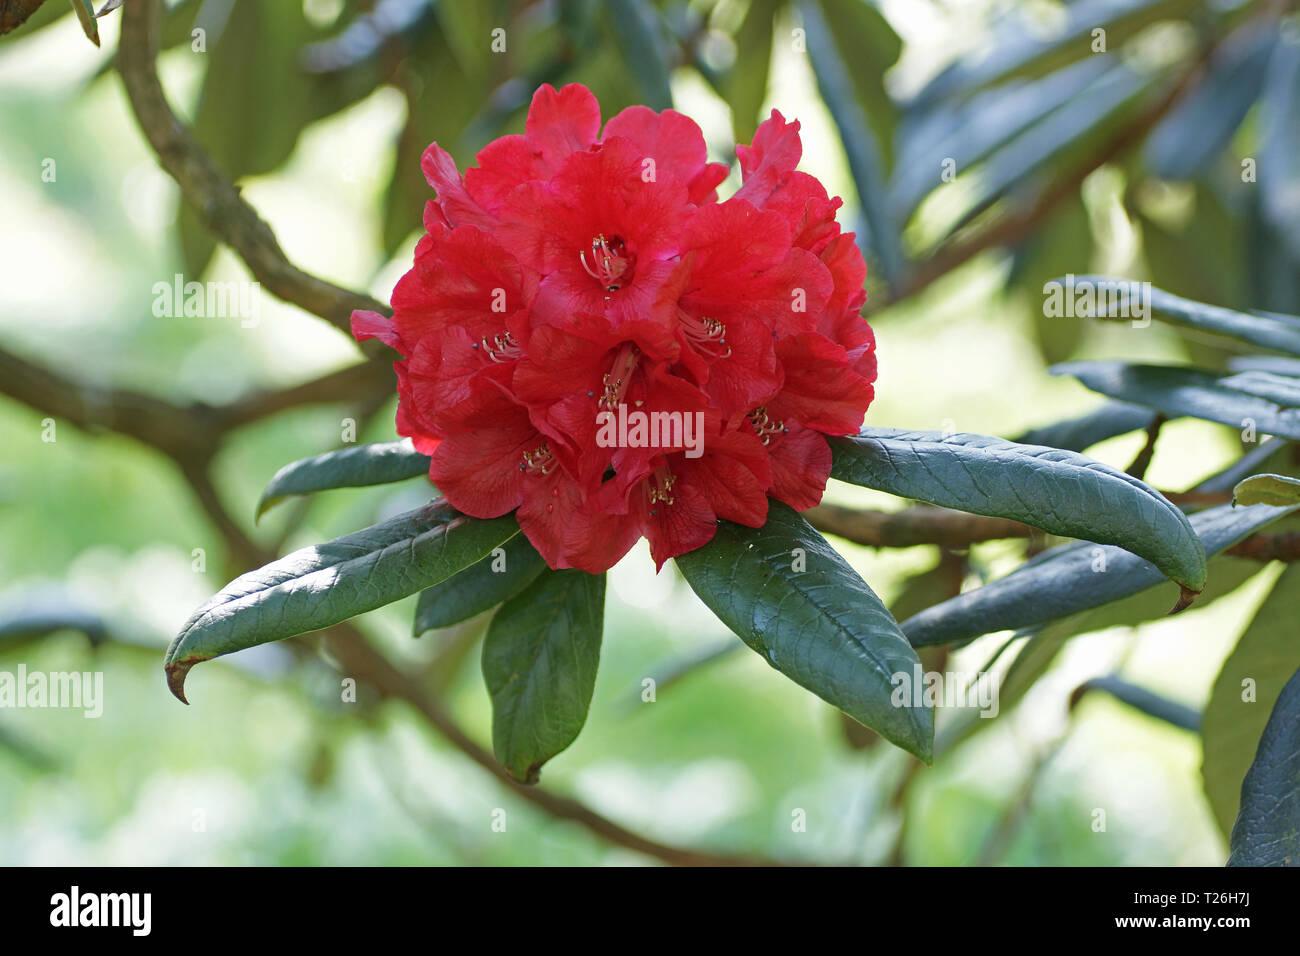 Rhododendron arboreum ssp. zeylanicum - Stock Image